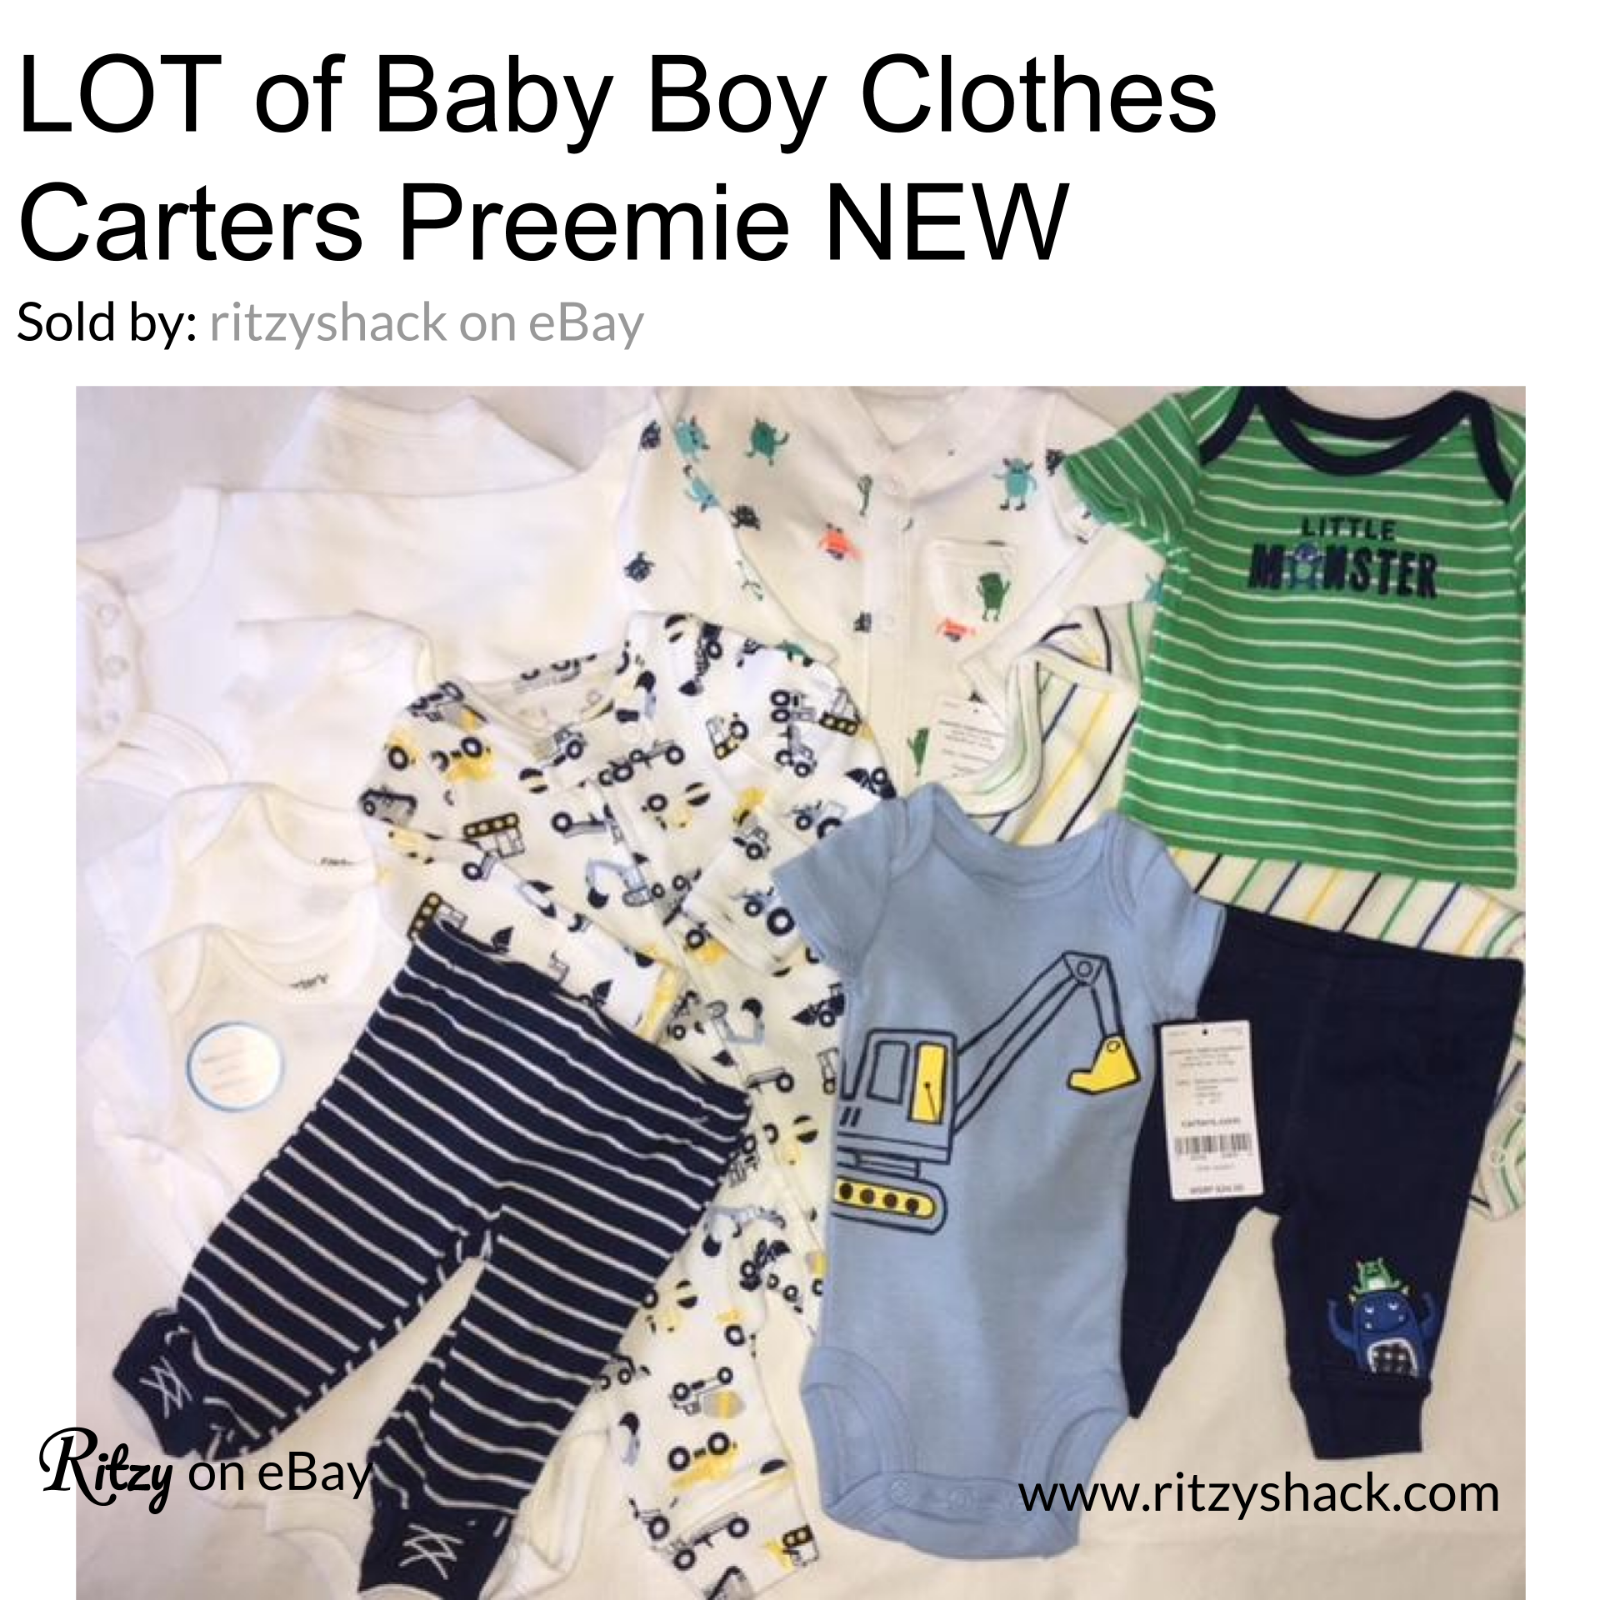 e0b4eae30 Carters Baby Boys Clothes Preemie Newborn and similar items. S l1600